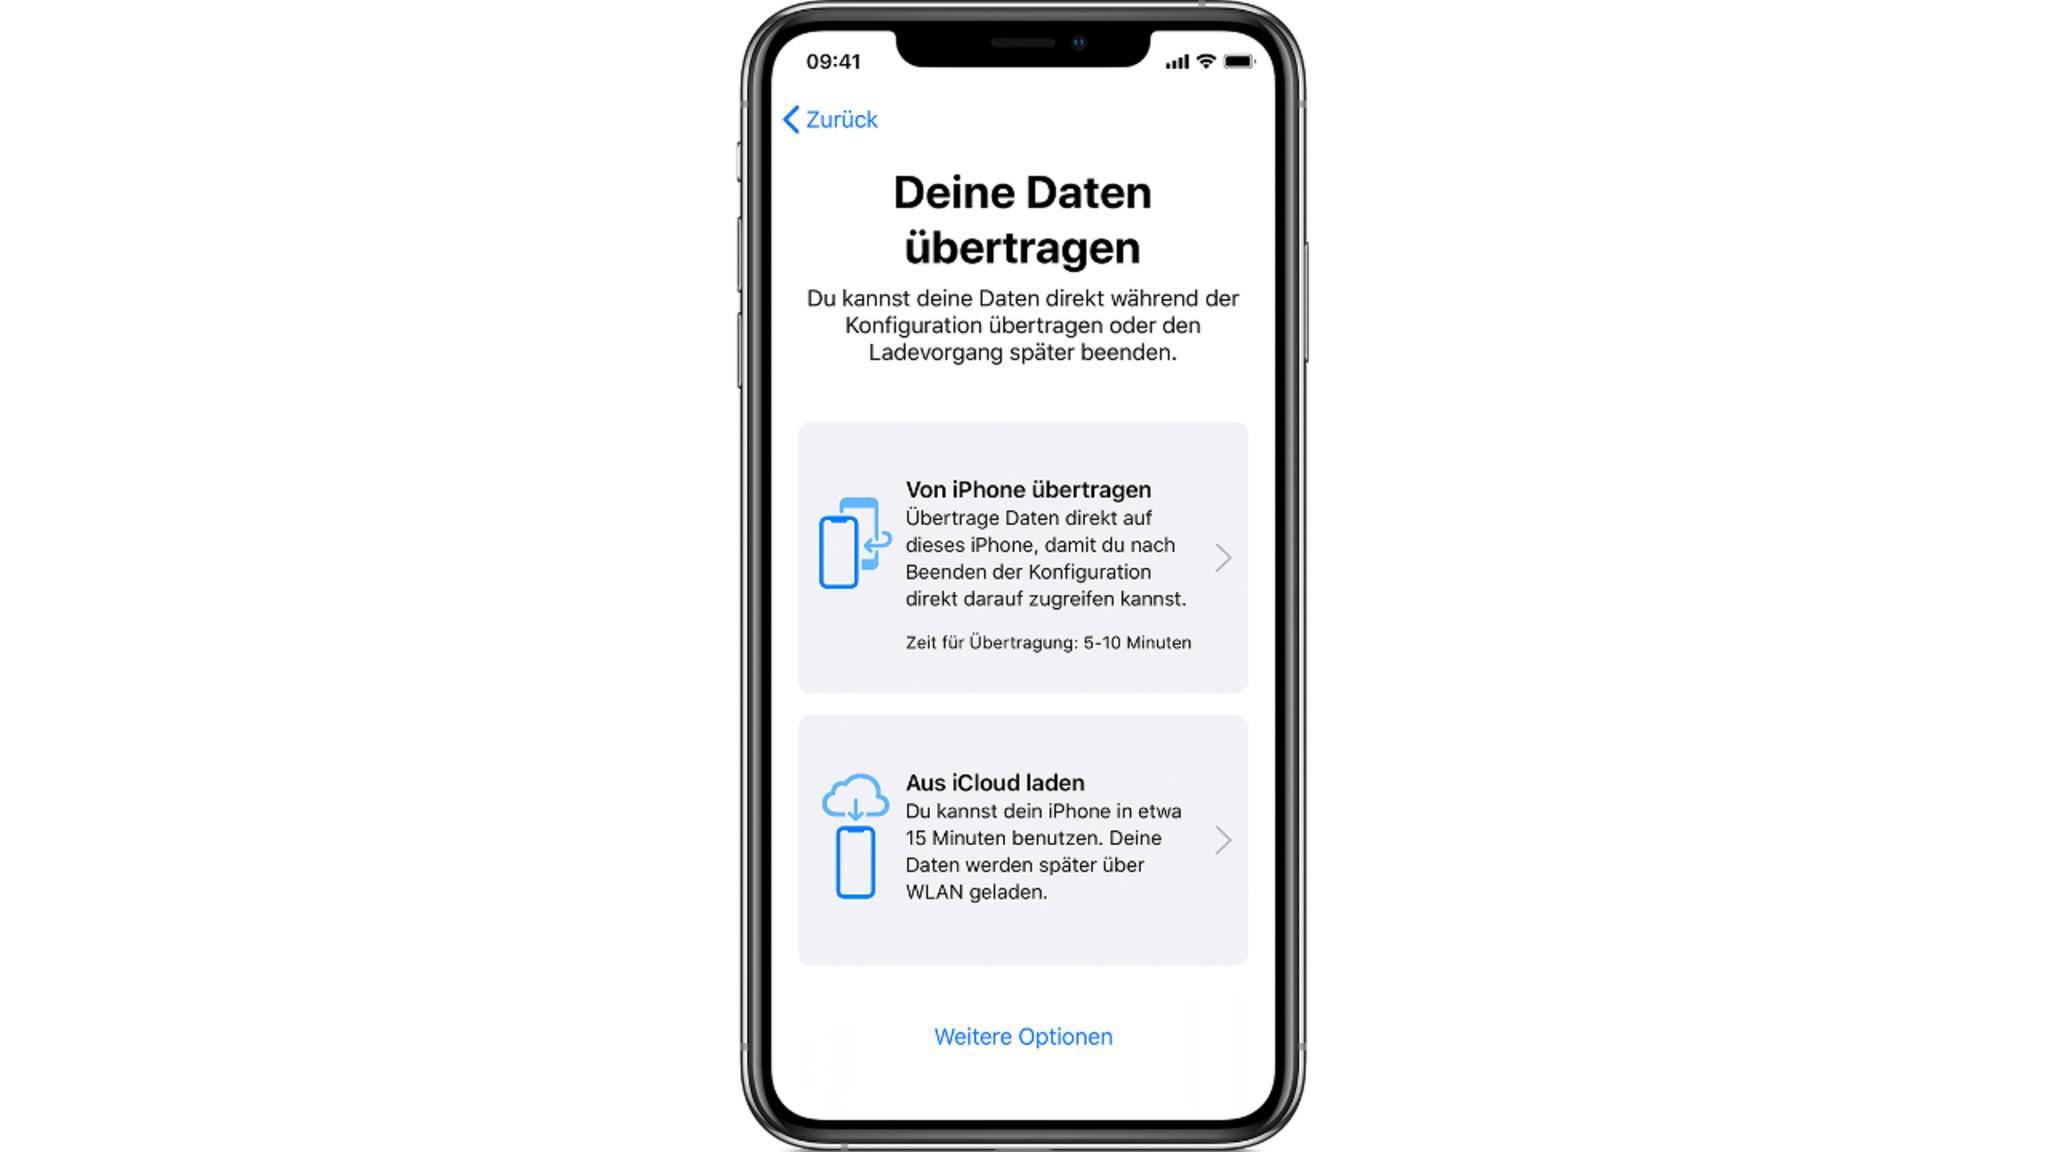 iPhone-Migration Daten übertragen